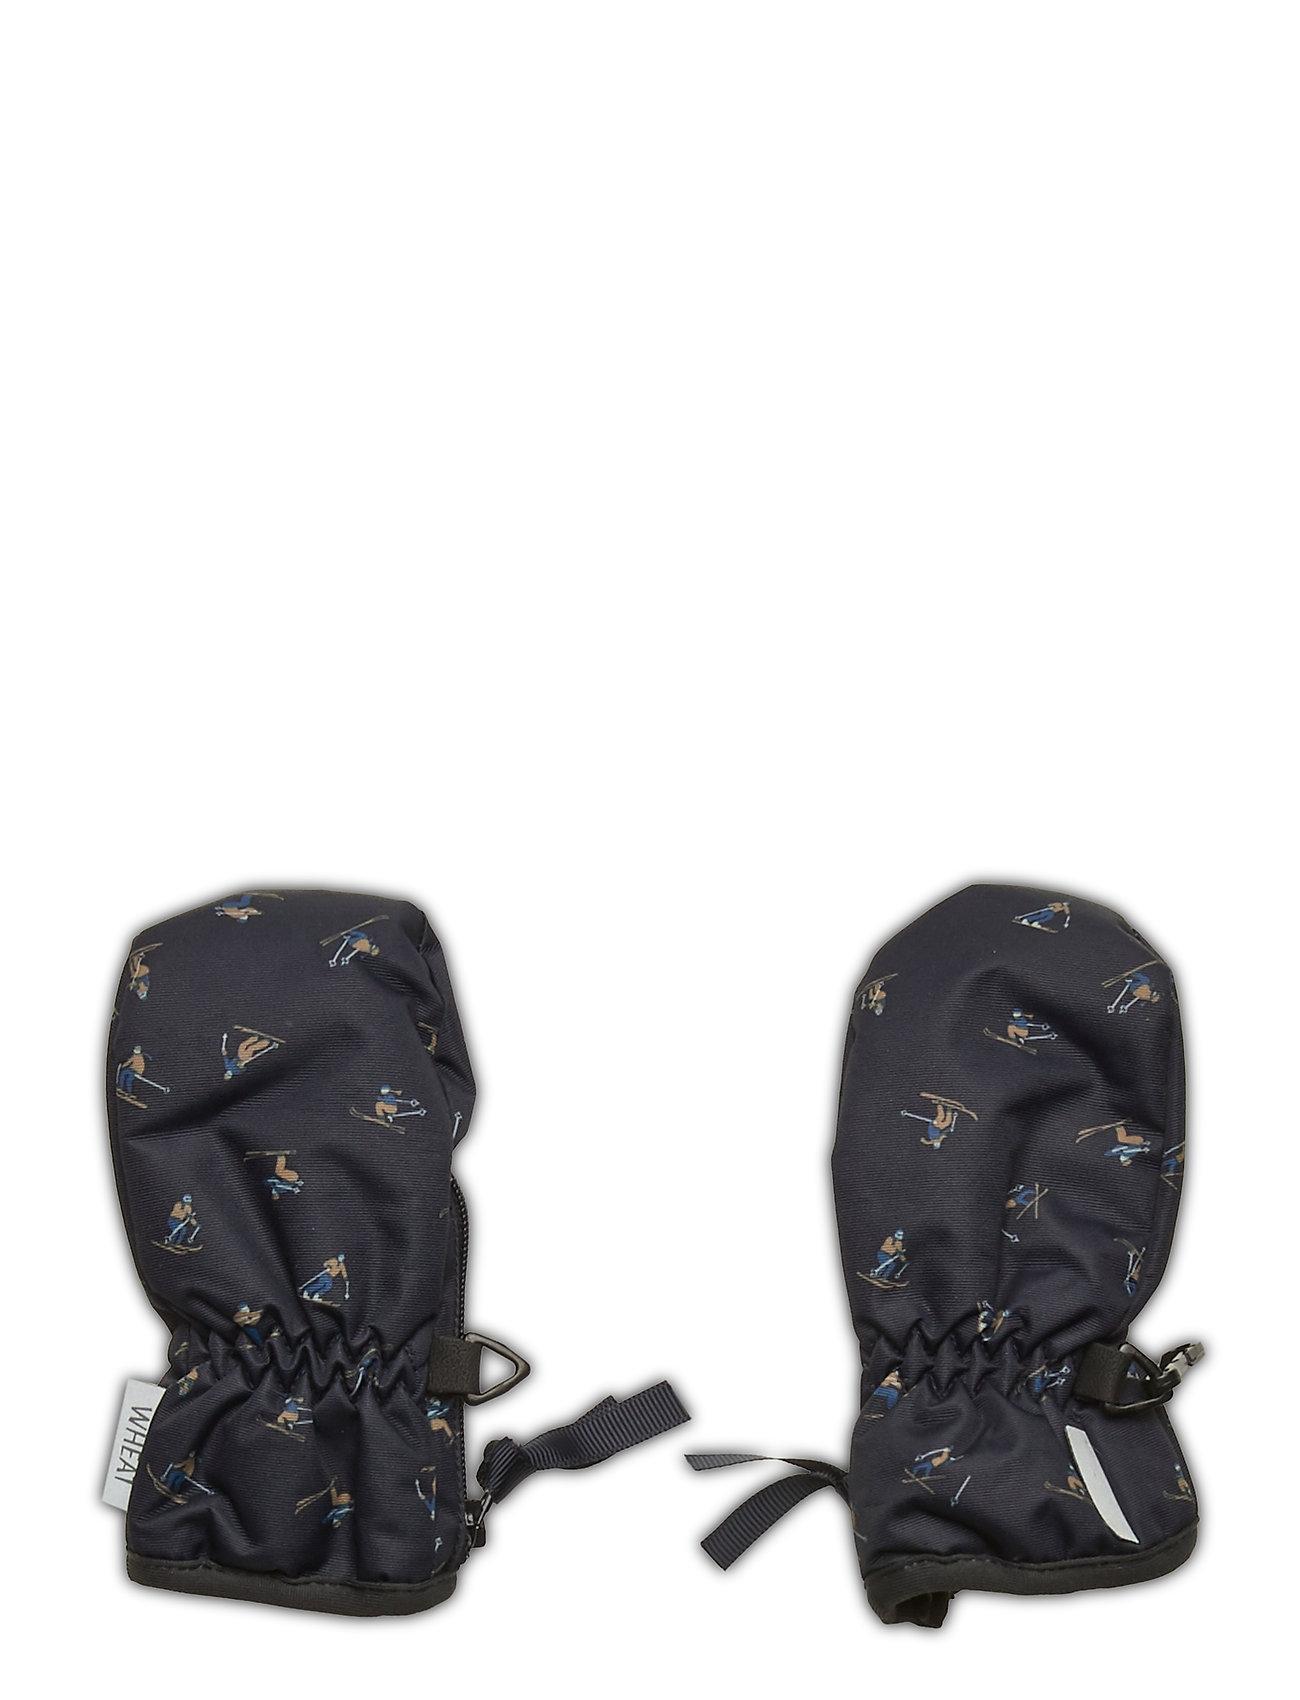 Image of Mittens Zipper Tech Outerwear Rainwear Accessories Sort Wheat (3446398033)